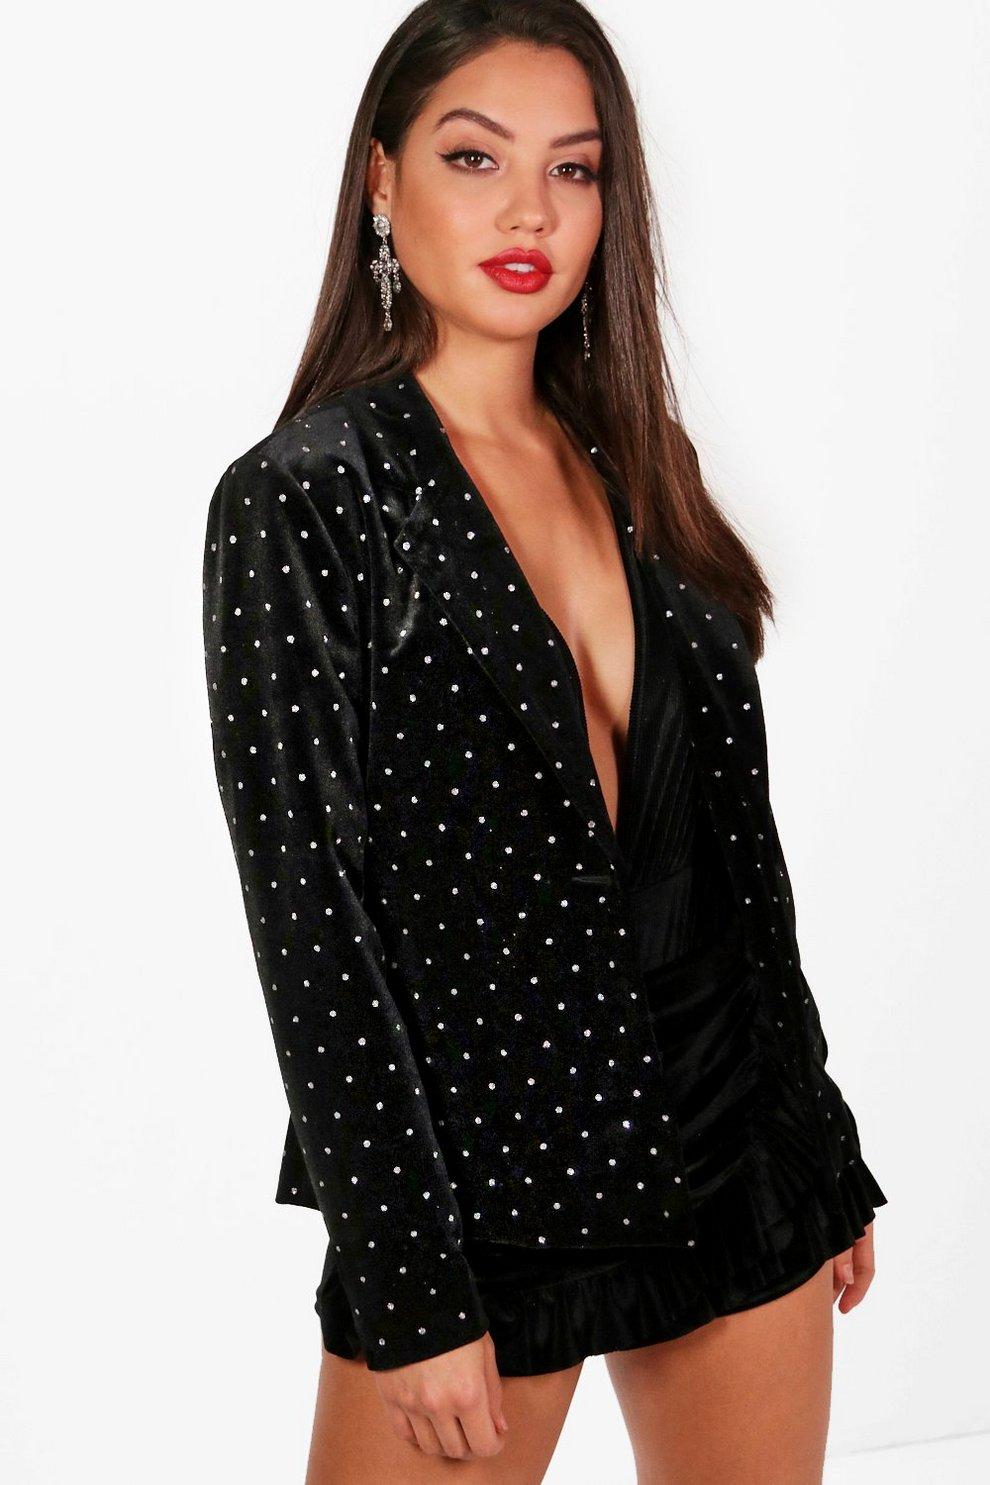 860ac3f3d5f46 Boutique Glitter Spot Velvet Blazer | Boohoo